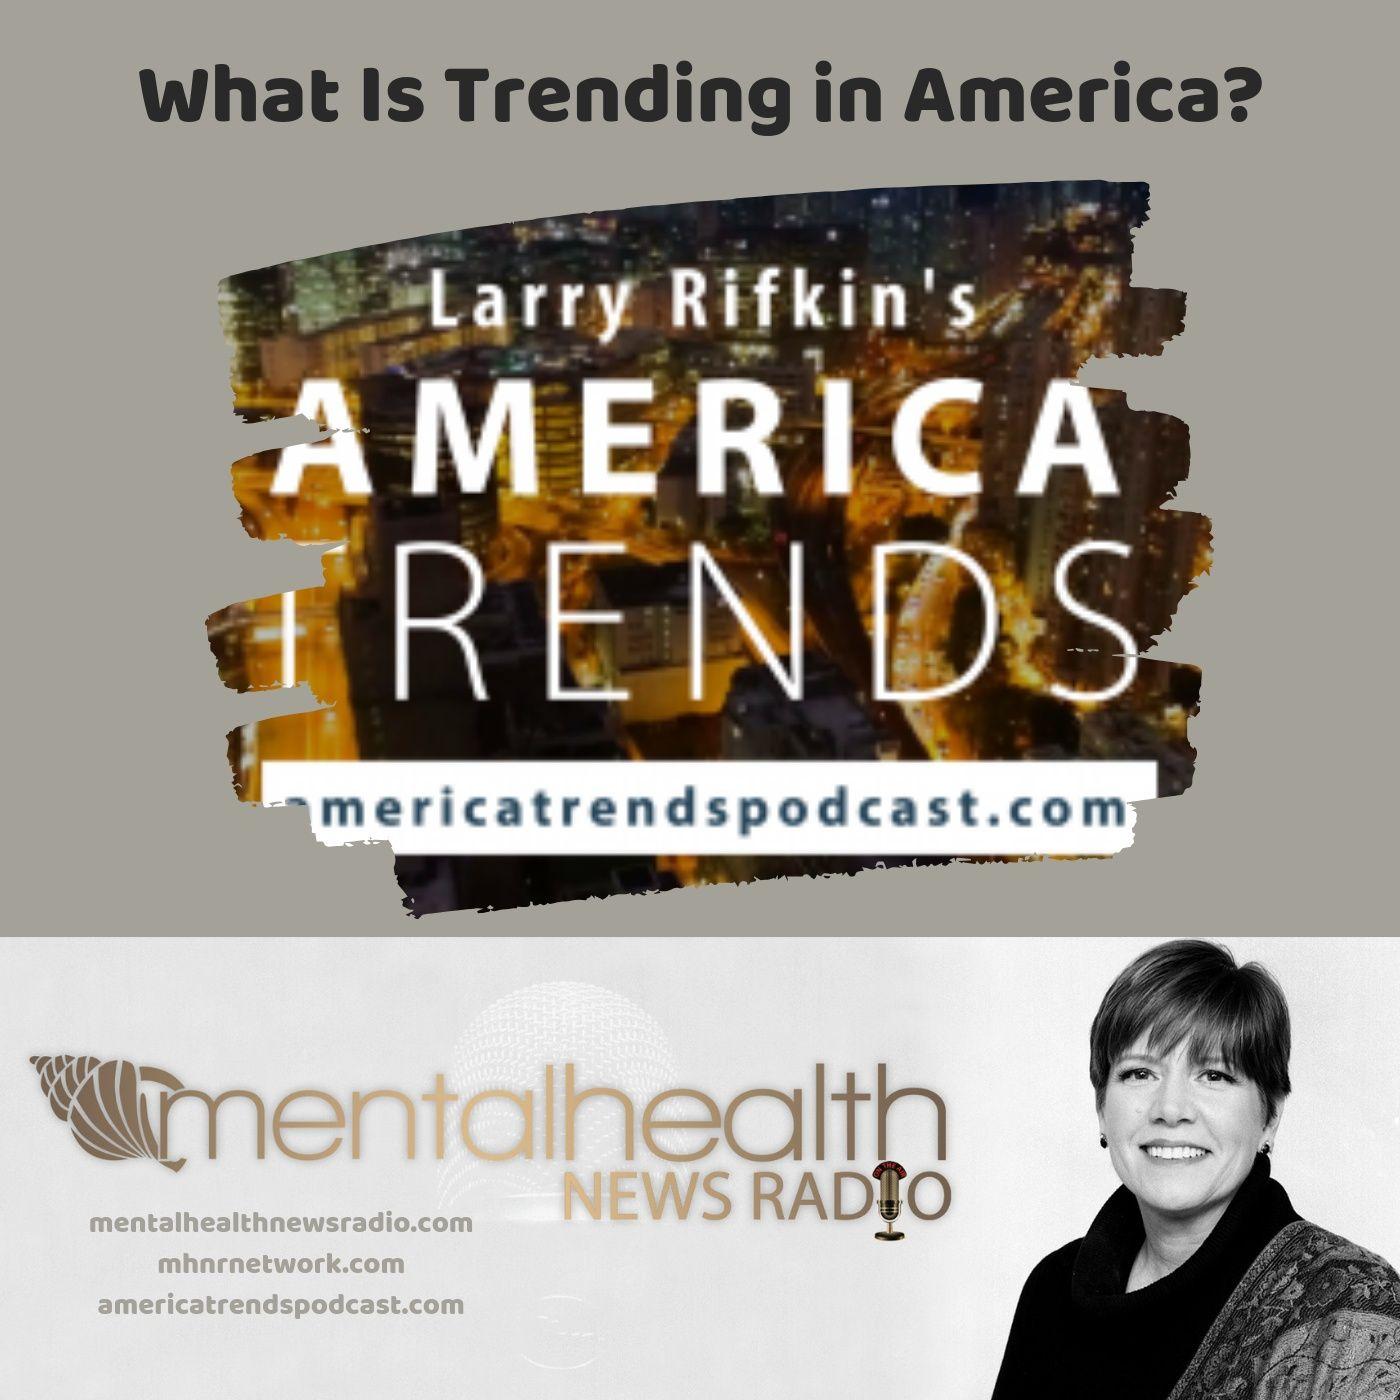 Mental Health News Radio - What IS Trending in America?